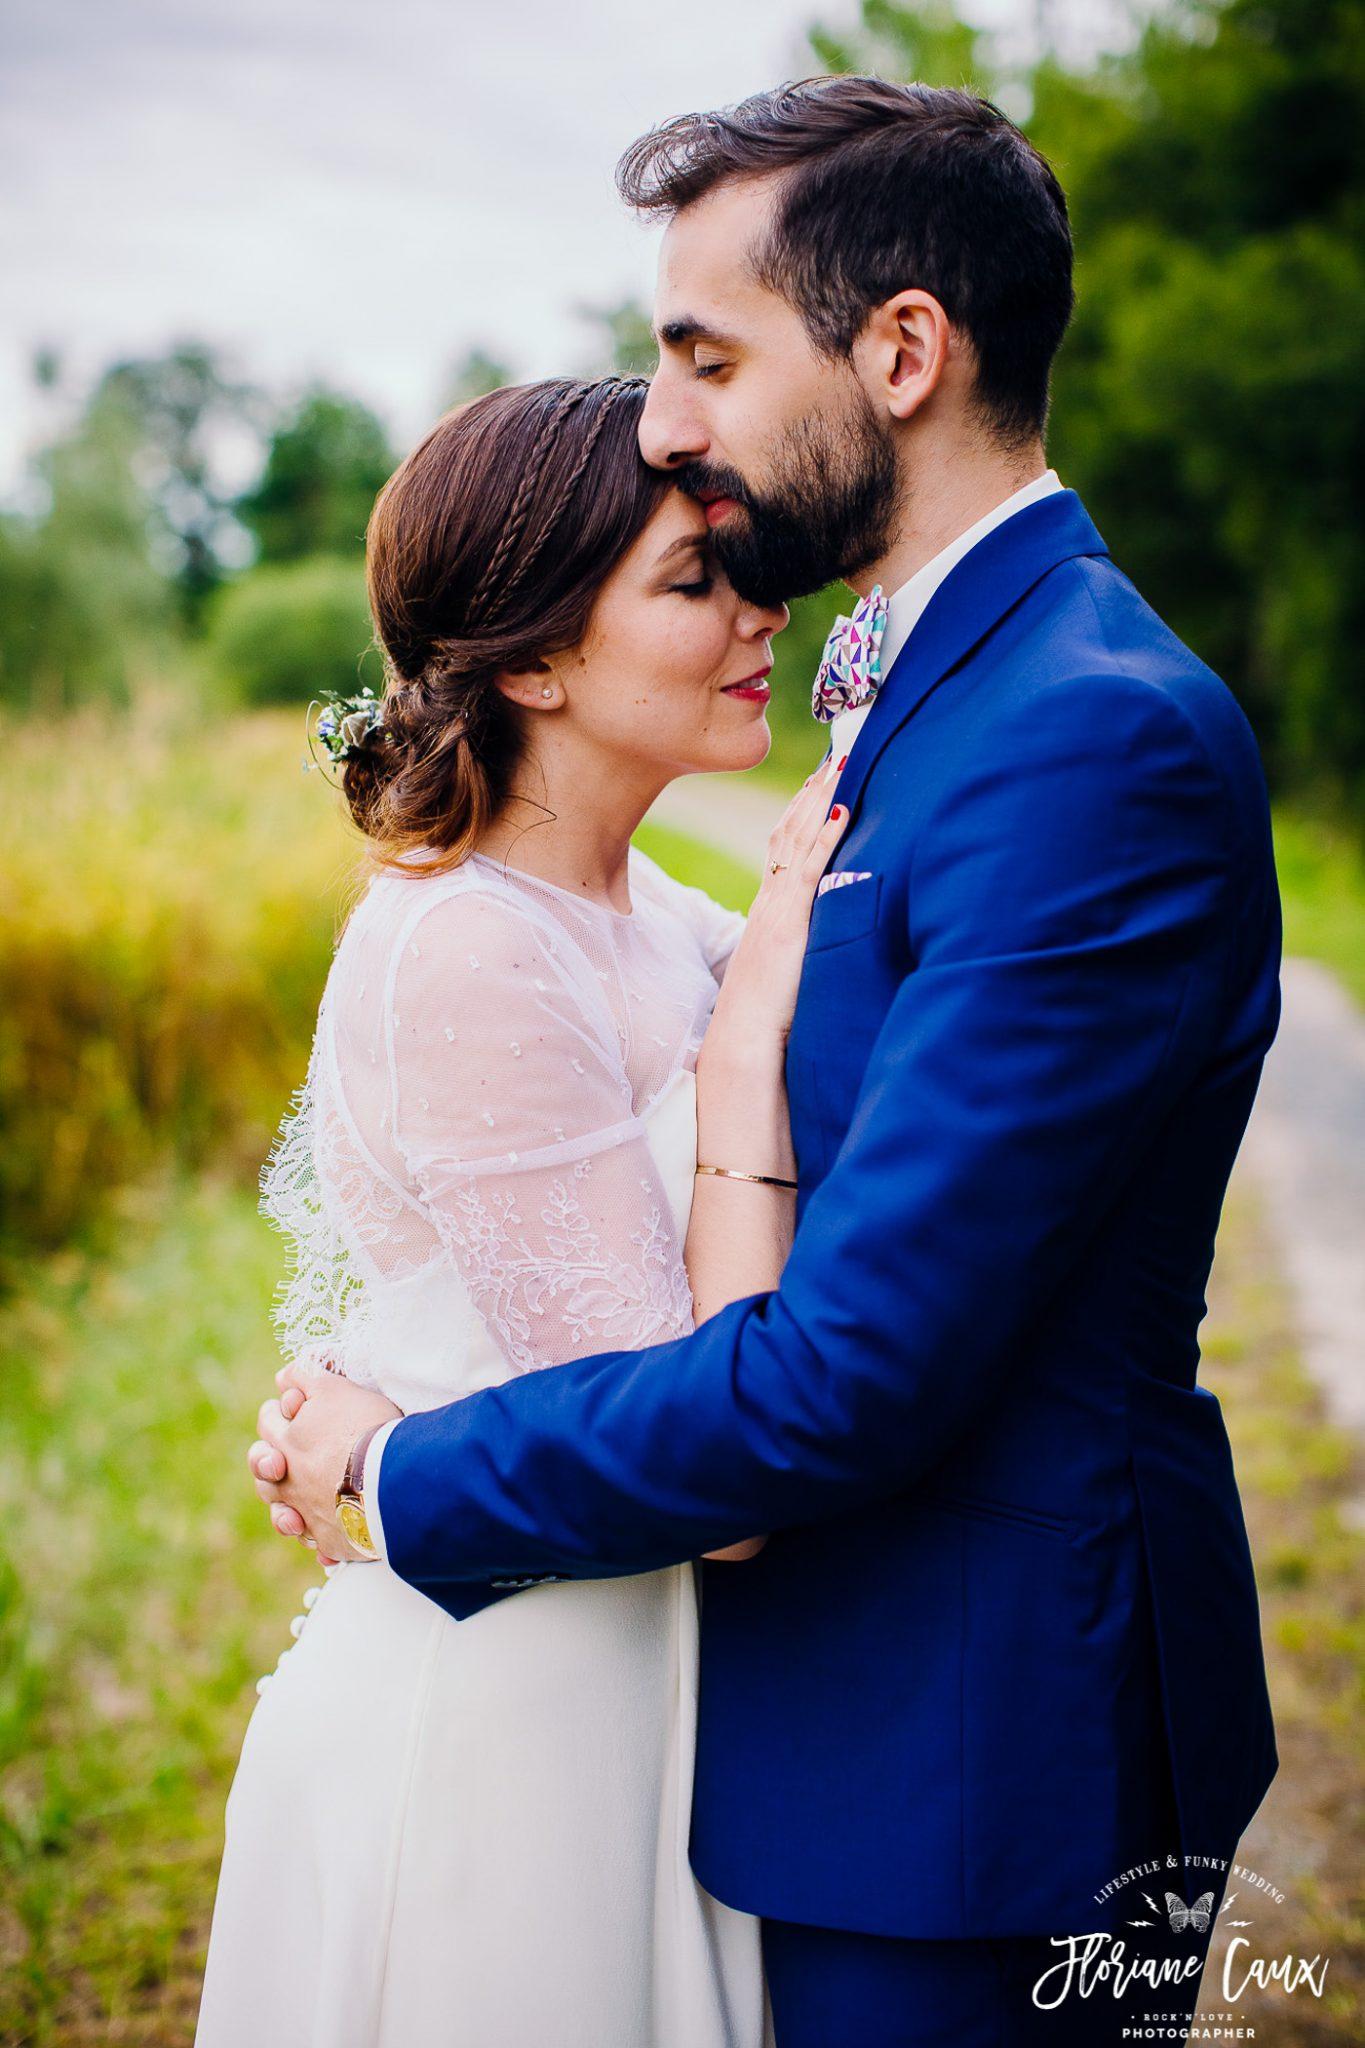 photographe-mariage-pays-basque-Floriane-Caux (38)